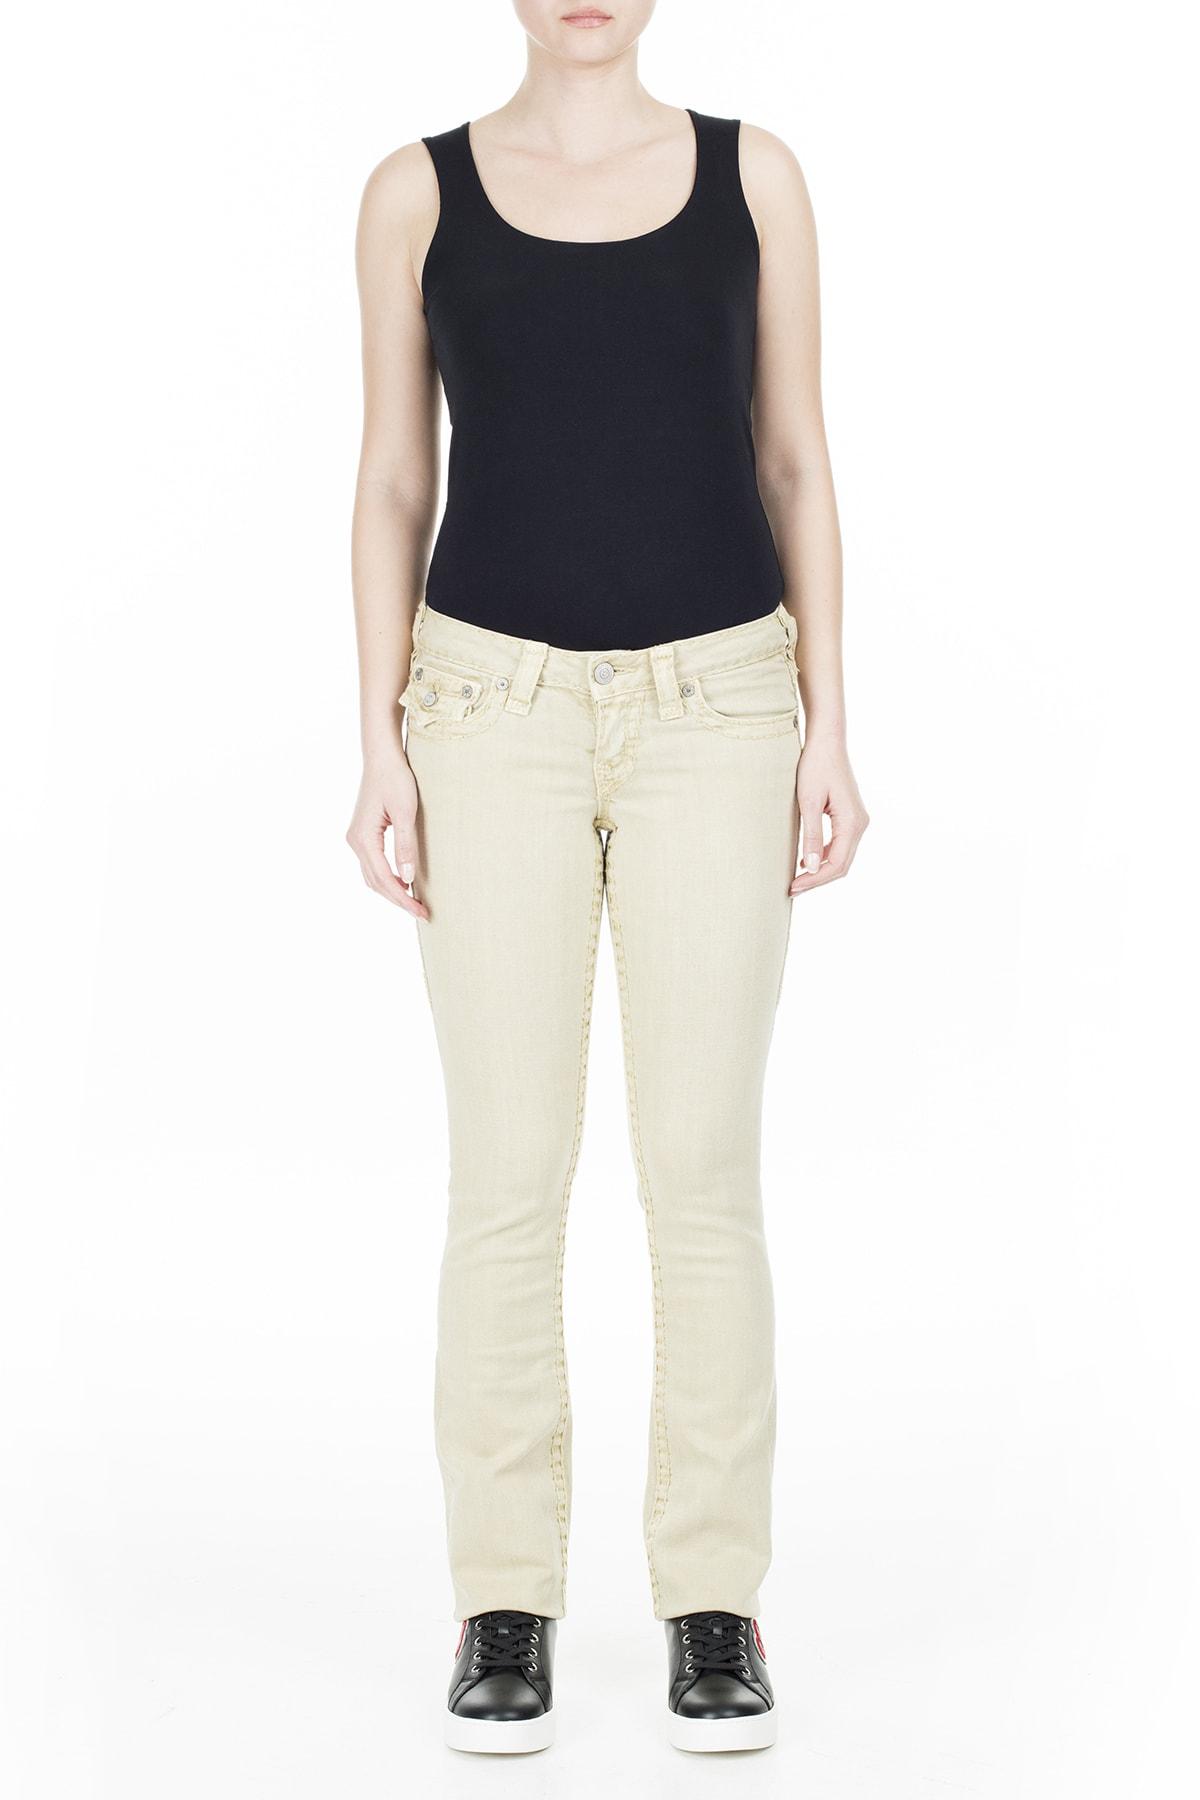 True Religion Jeans Kadın Kot Pantolon W95572N99 0